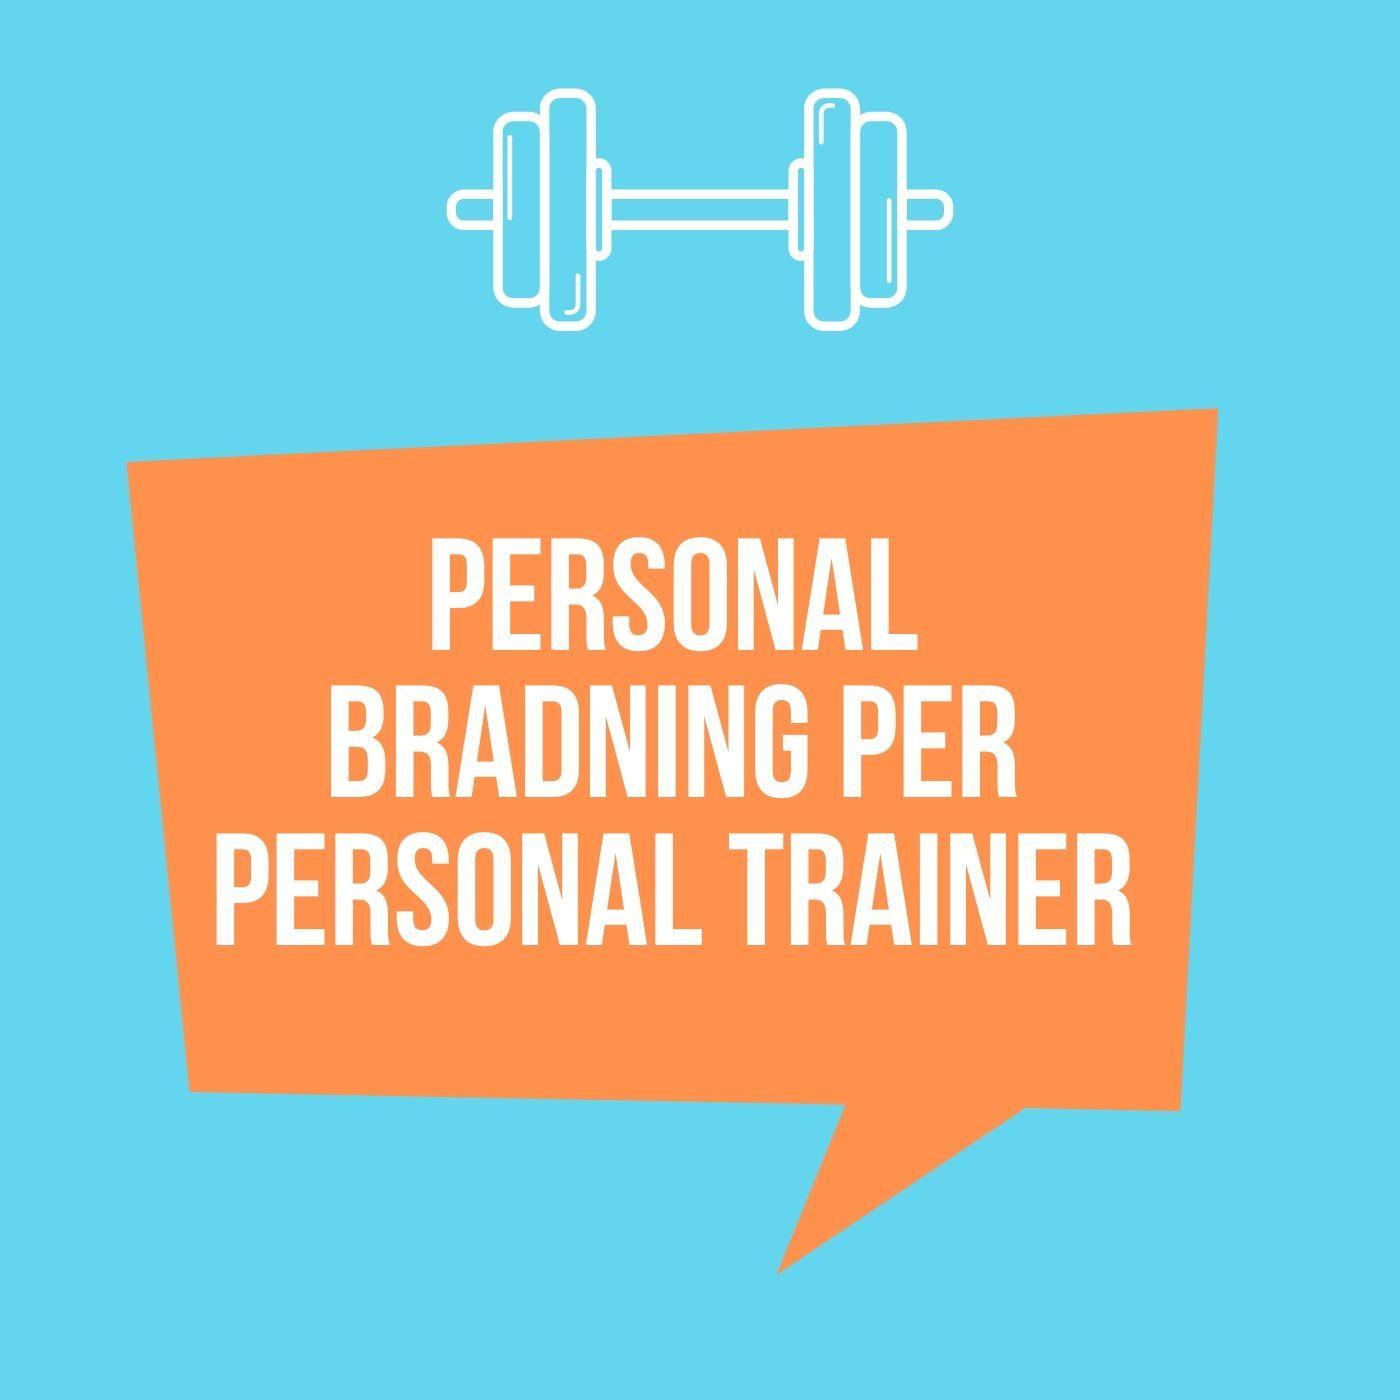 Personal branding per personal trainer